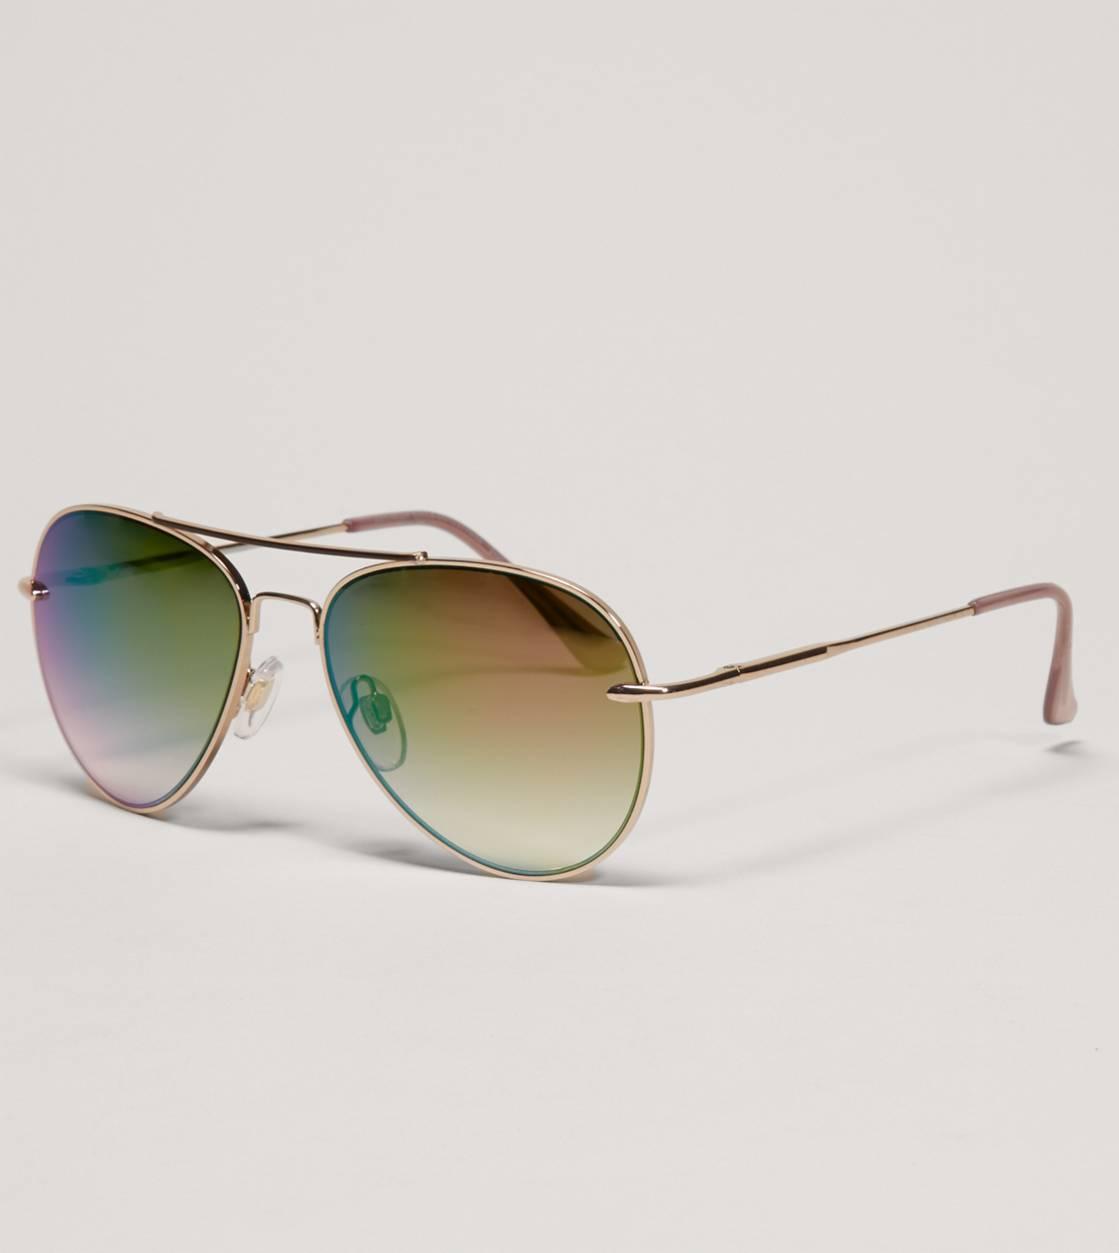 aeo aviator sunglasses american eagle outfitters